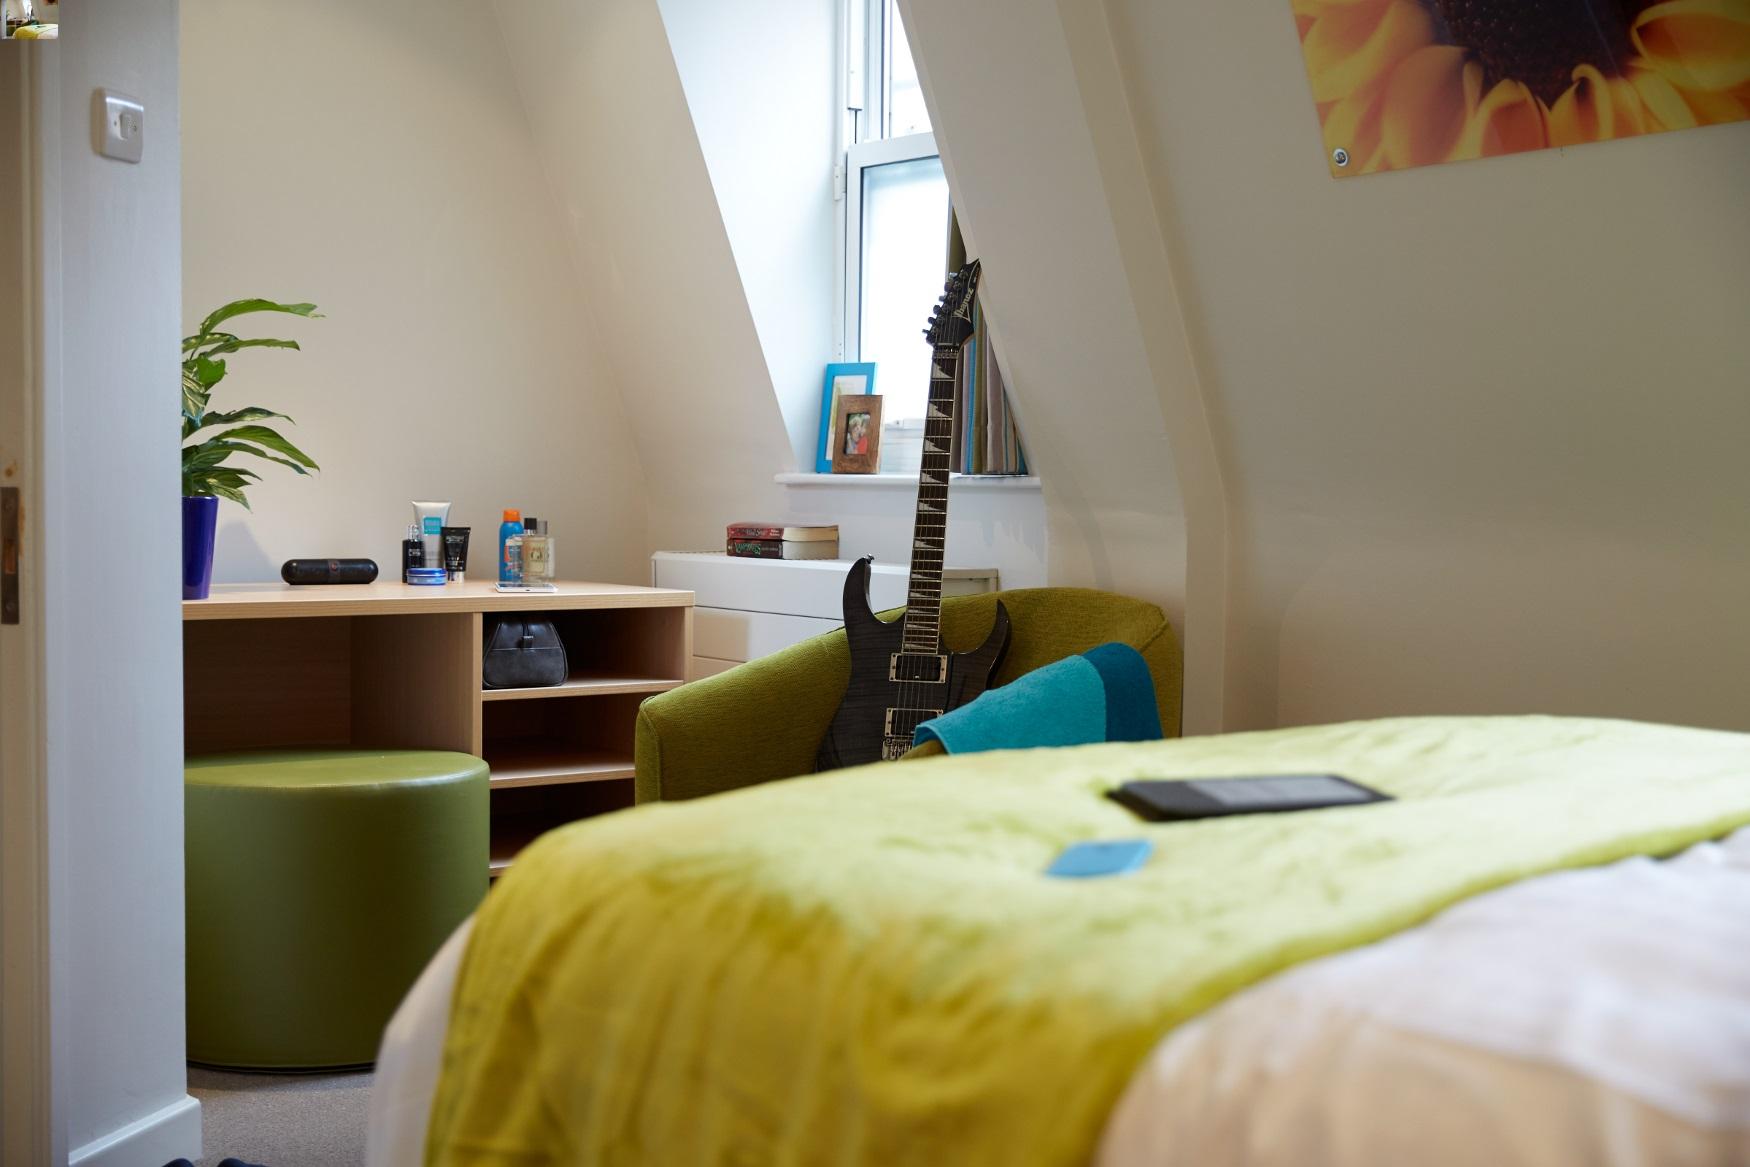 Private Mental Health Adolescent Unit Bedroom